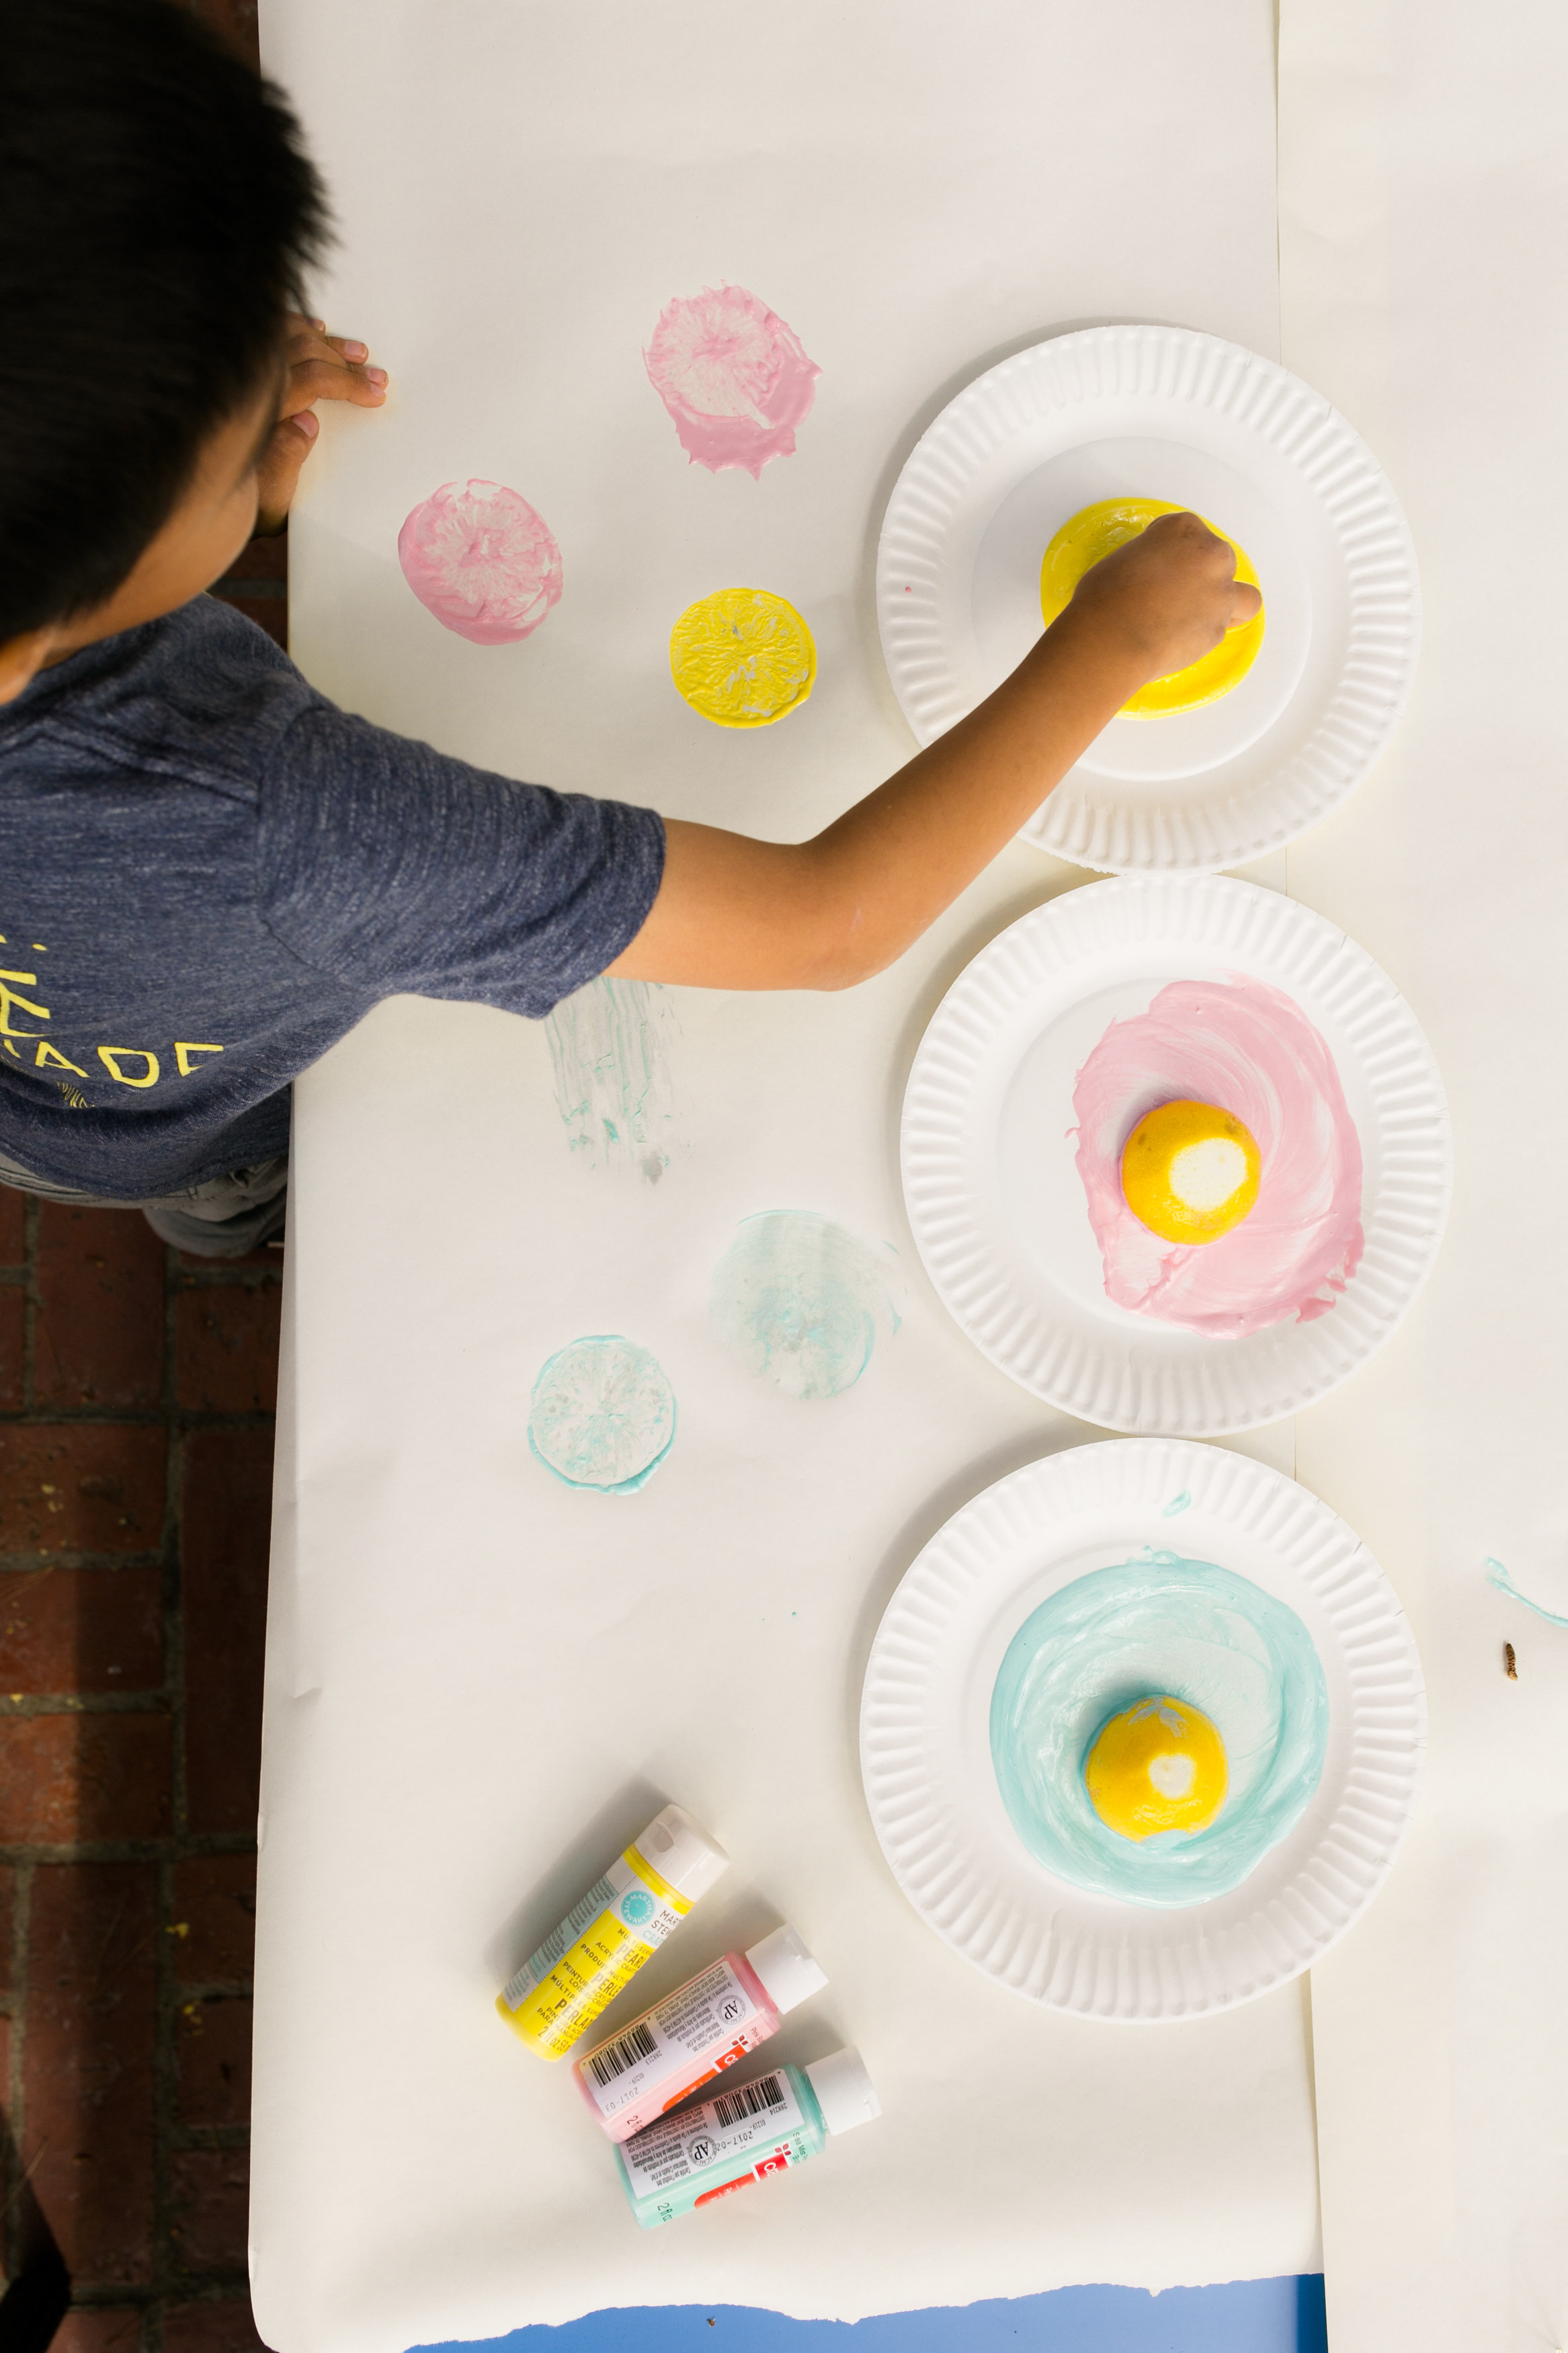 Lemonade Kids Birthday Lemon Stamping Craft - DIY Real Lemon Stamps with Paint